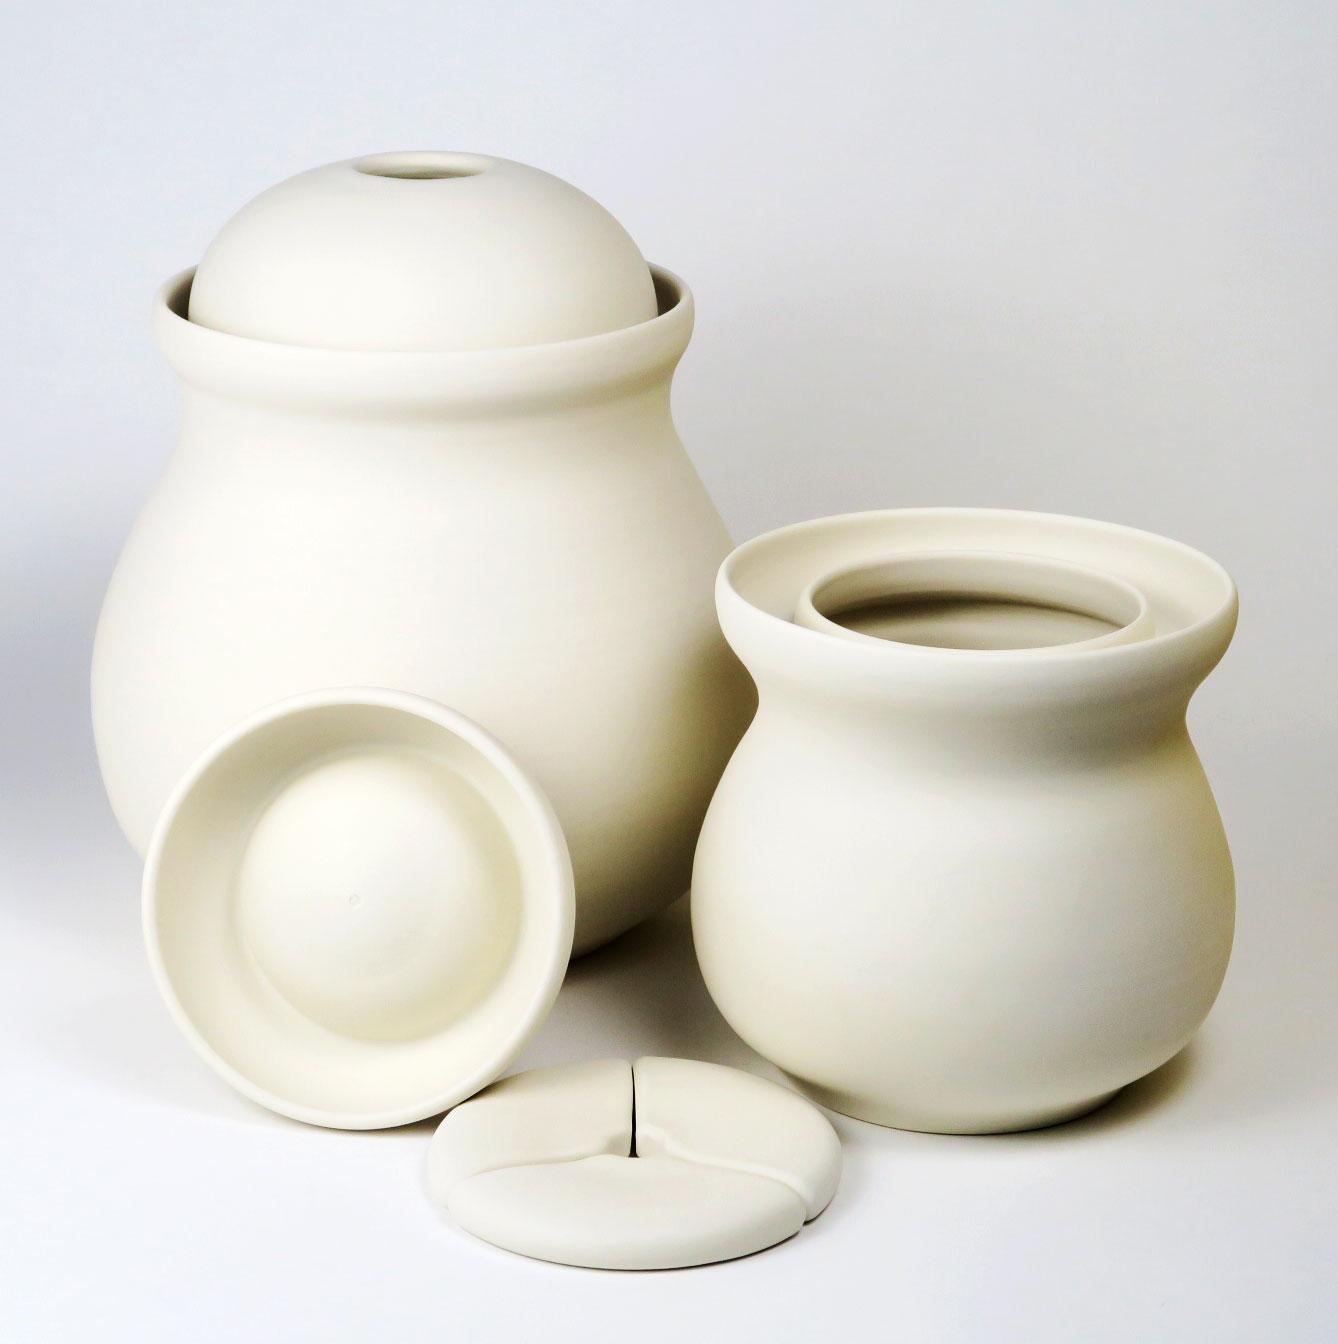 kitchen crock hotel with hong kong fermentation crocks tools luscious porcelain